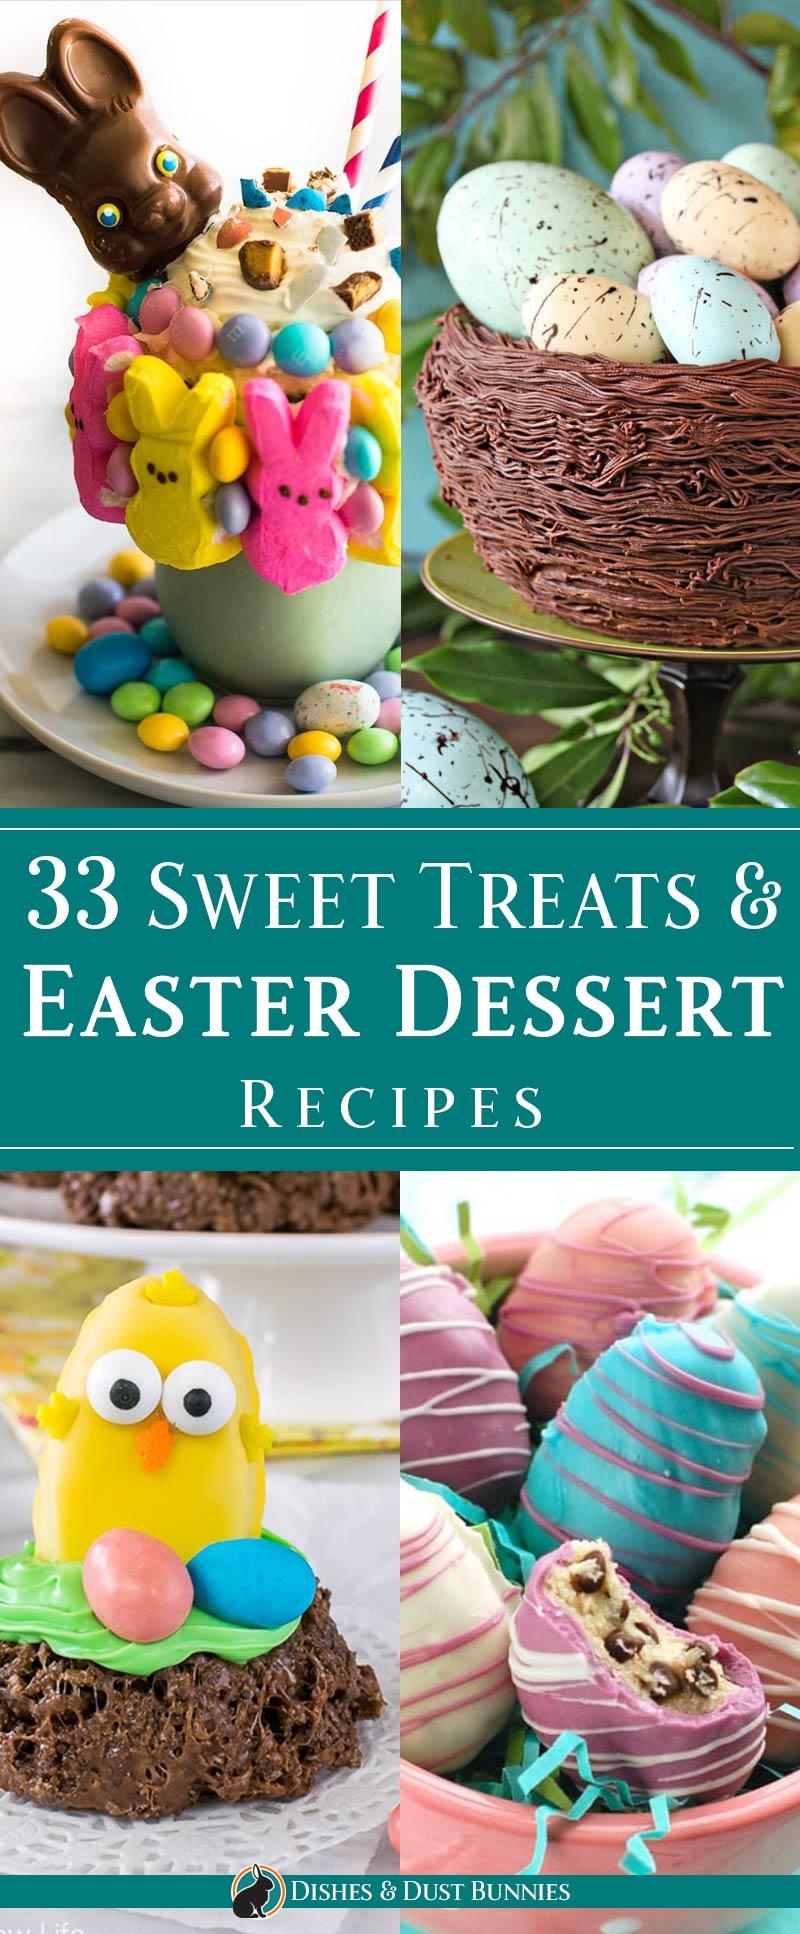 33 Sweet Treats and Easter Dessert Recipes - dishesanddustbunnies.com